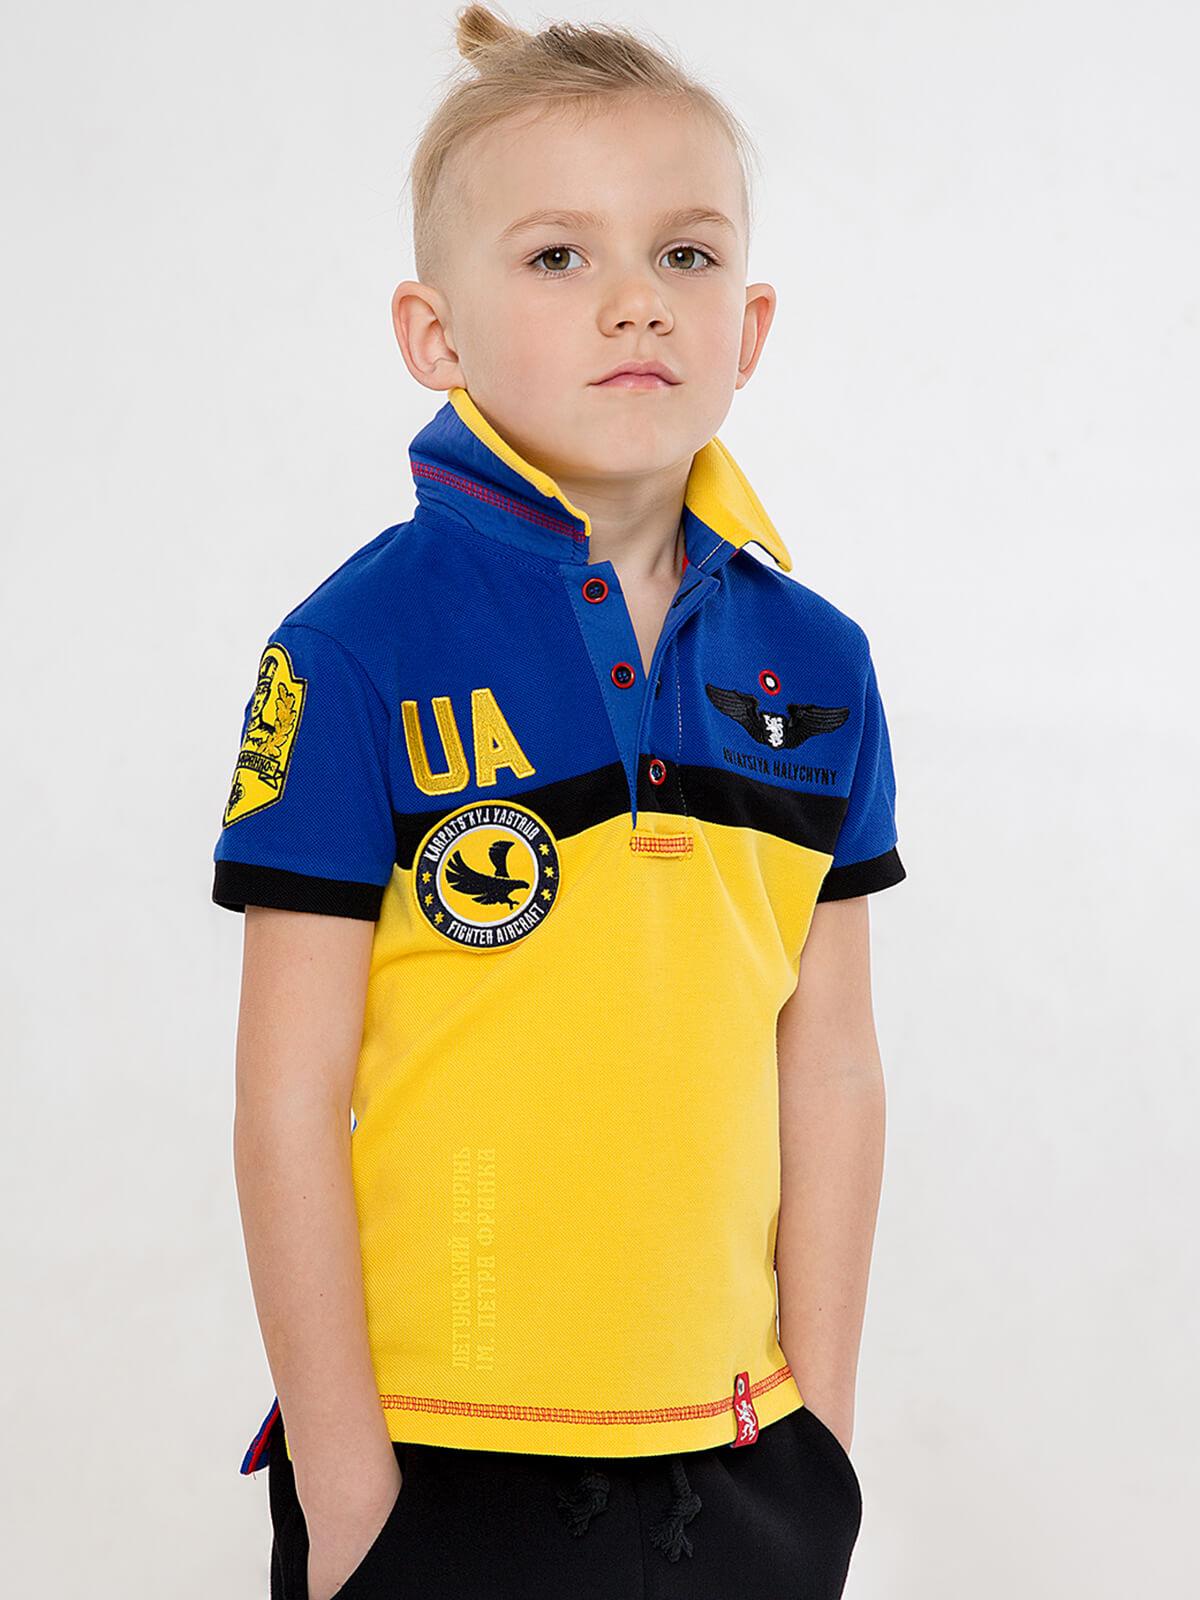 Kids Polo Shirt 7 Brigade (Petro Franko). Color navy blue. Pique fabric: 100% cotton.